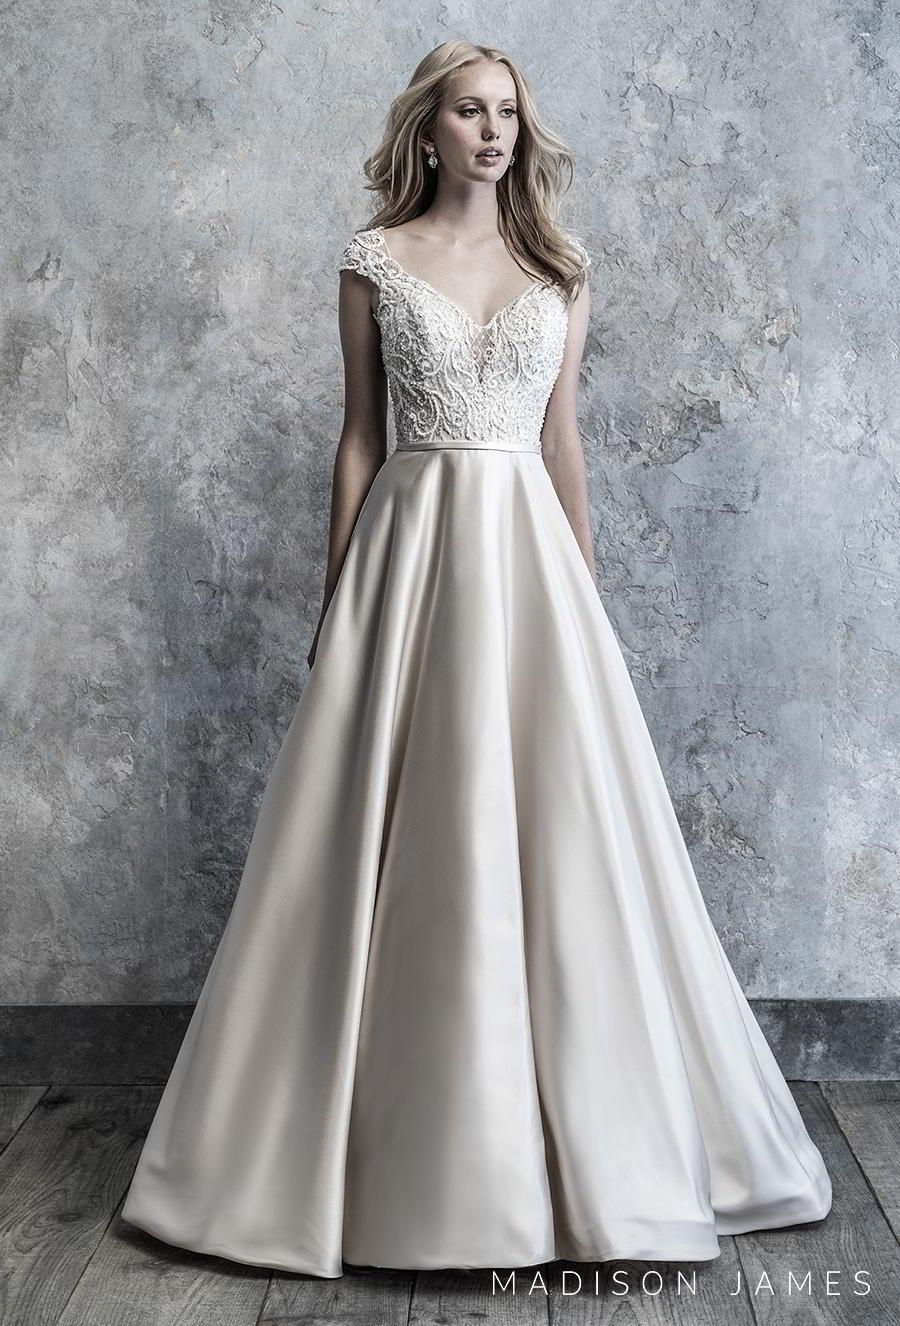 madison james 2019 bridal cap sleeves v neck heavily embellished bodice satin skirt romantic a line wedding dress v back chapel train (506) mv